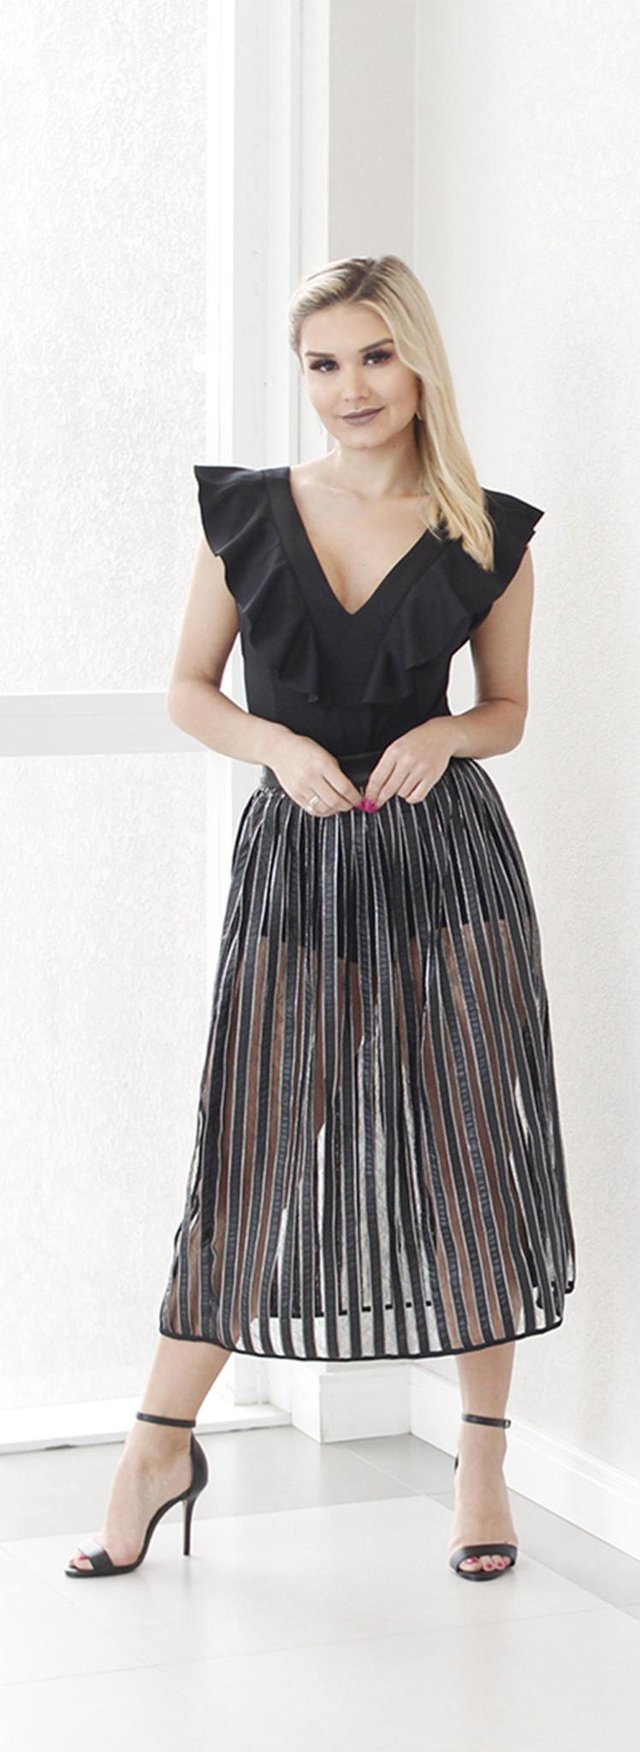 Modelo caxiense Gabriela Baccin veste looks da Namur Boutique, que inaugura nesta sexta-feira em Caxias